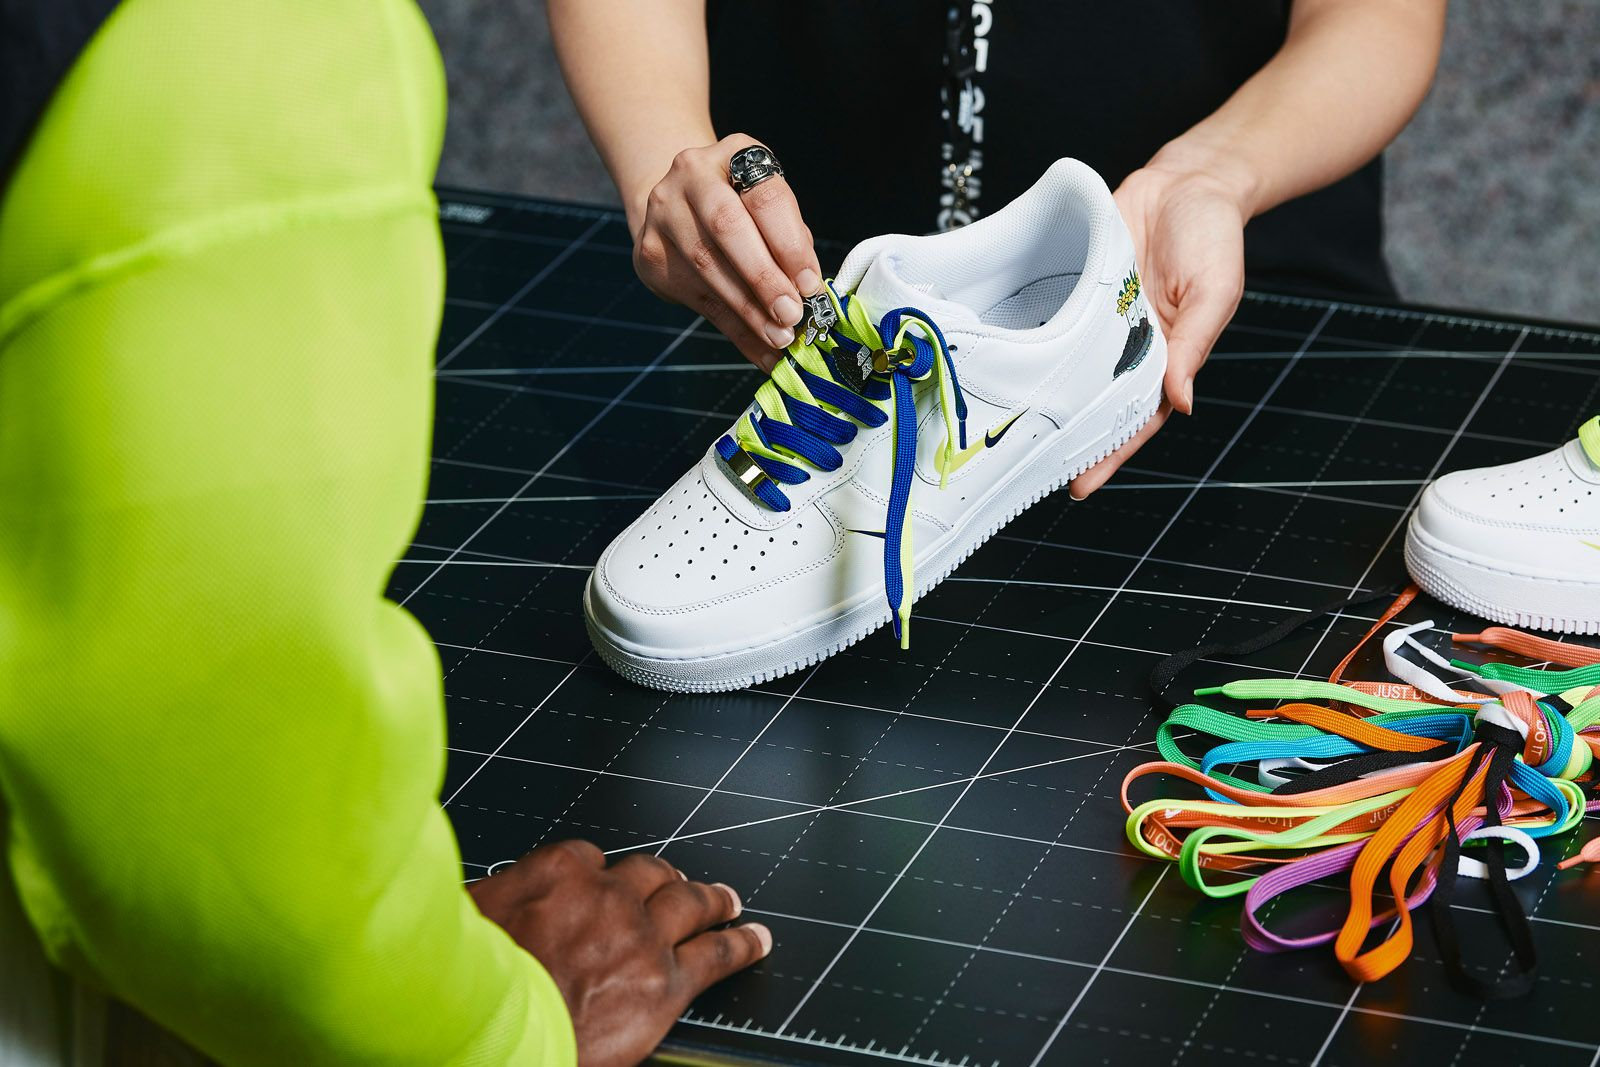 nikes-john-hoke-is-evolving-designs-golden-rules-to-save-sport-04